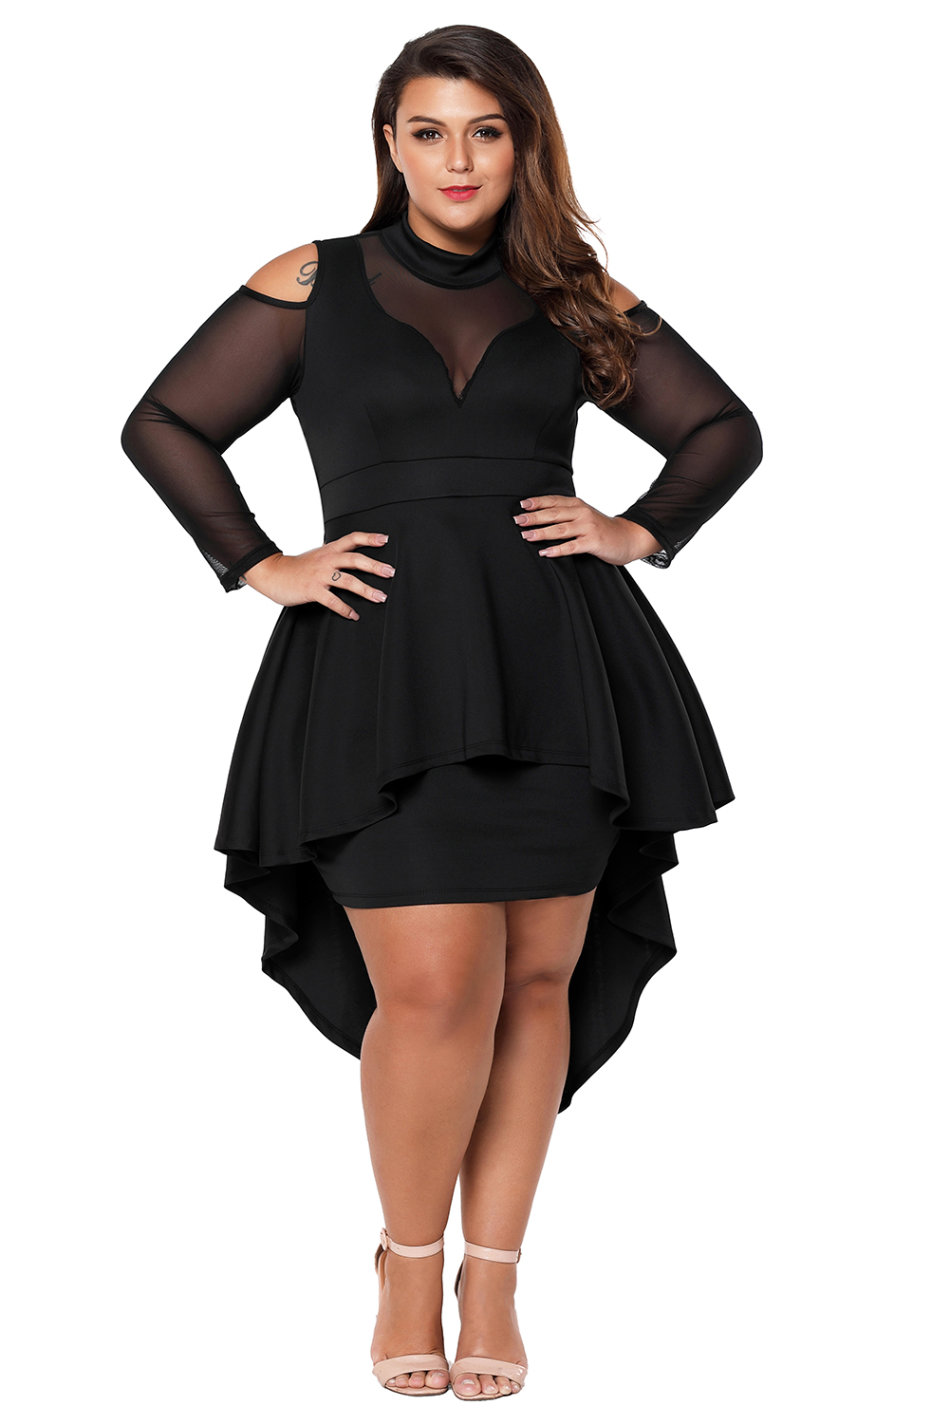 4ef0689144d Formal Dresses - Black Plus Size Mesh Trim Hi-Lo Peplum Dresses - XL ...